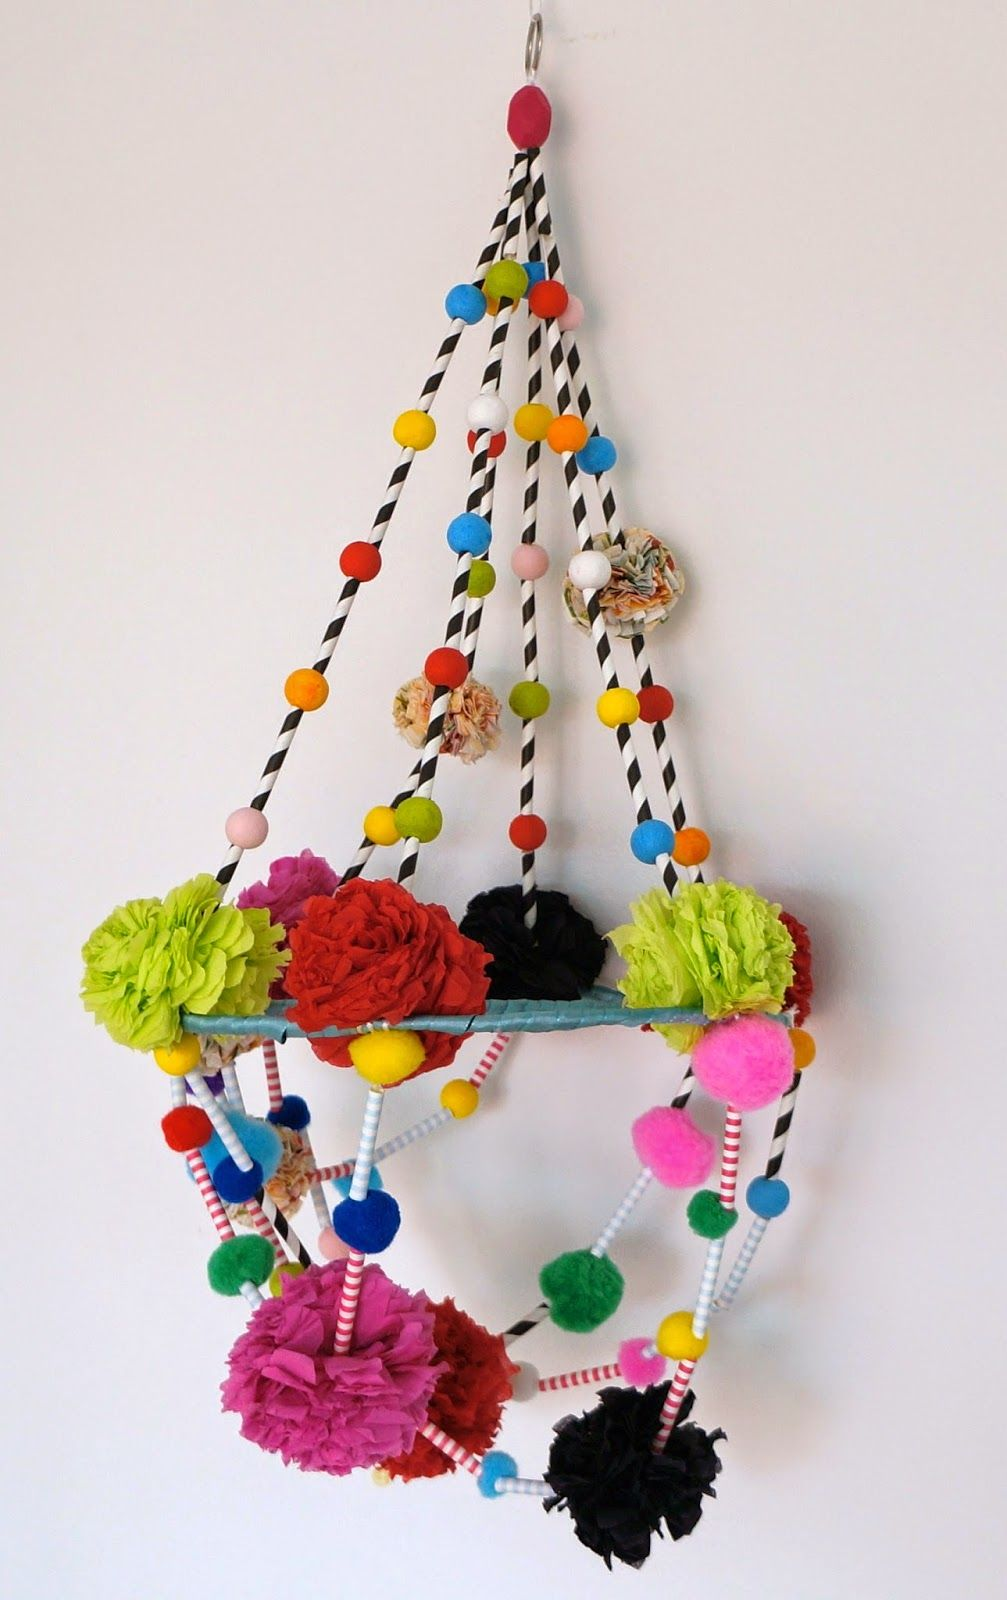 Minimal Boho: DIY: Polish pajaki chandelier   Craft Ideas ... for Paper Chandelier Craft  155fiz